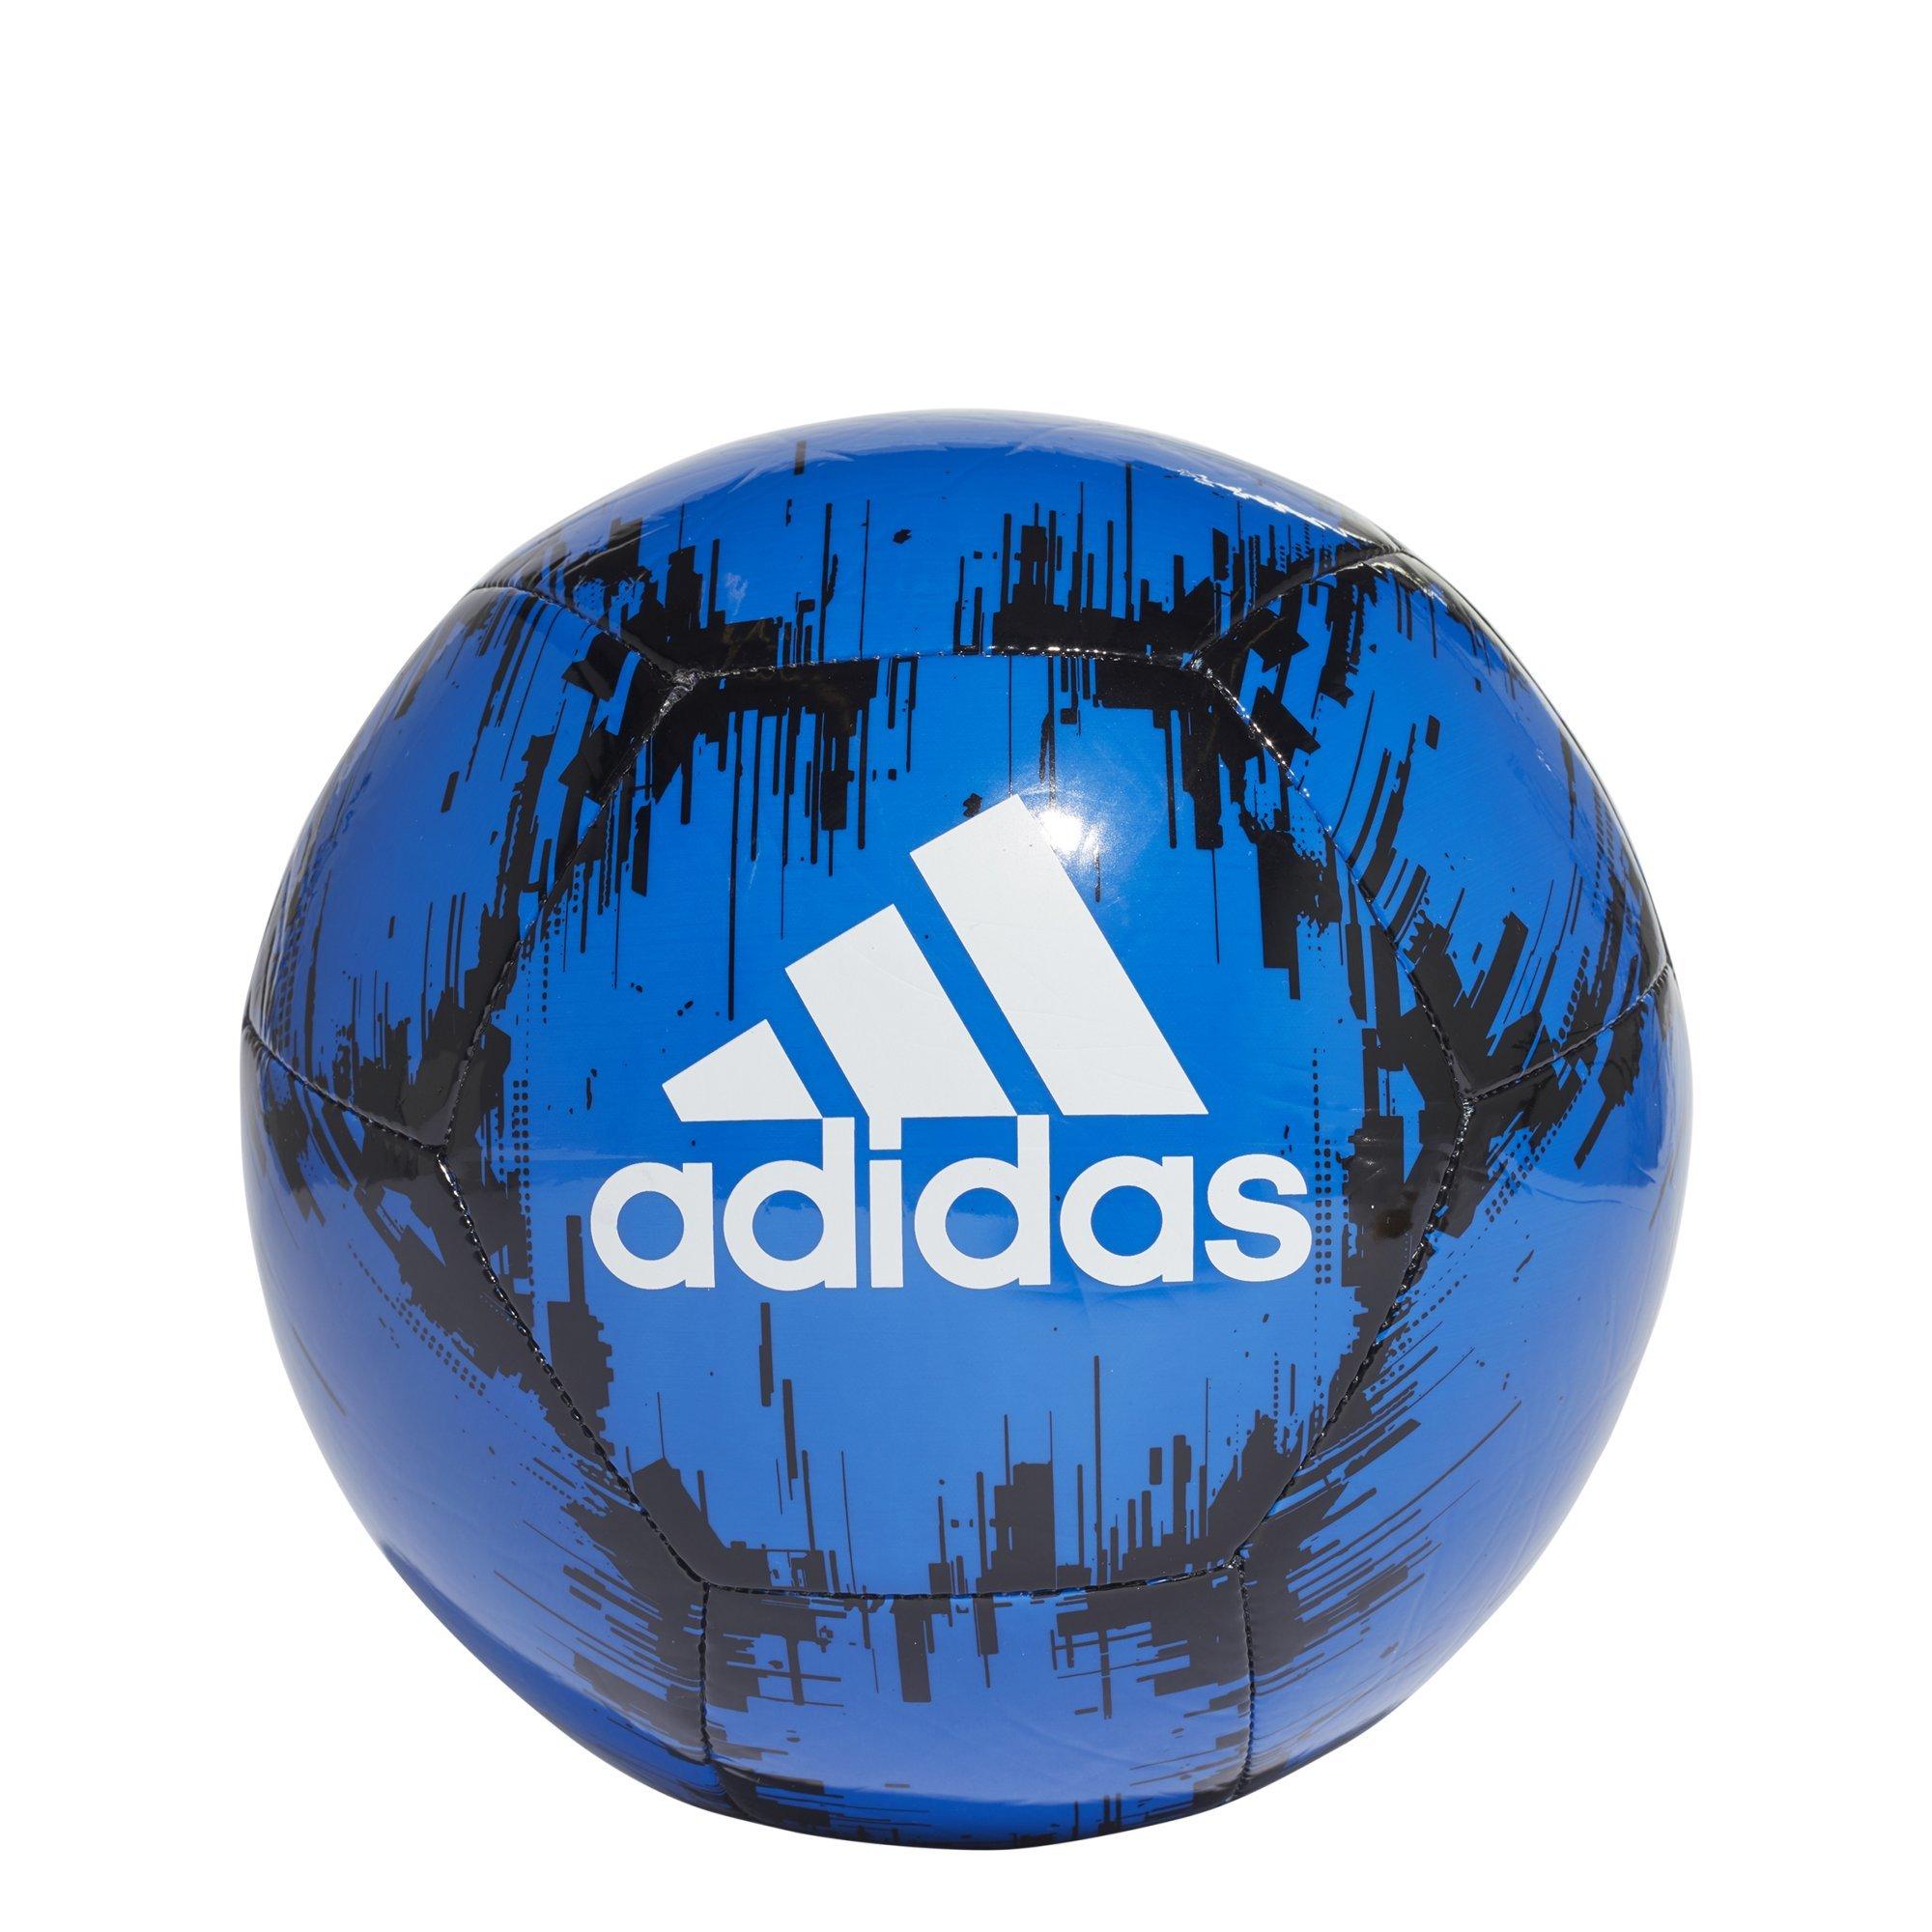 adidas Performance Ace Glider II Soccer Ball, Football Blue/Black/White, Size 3